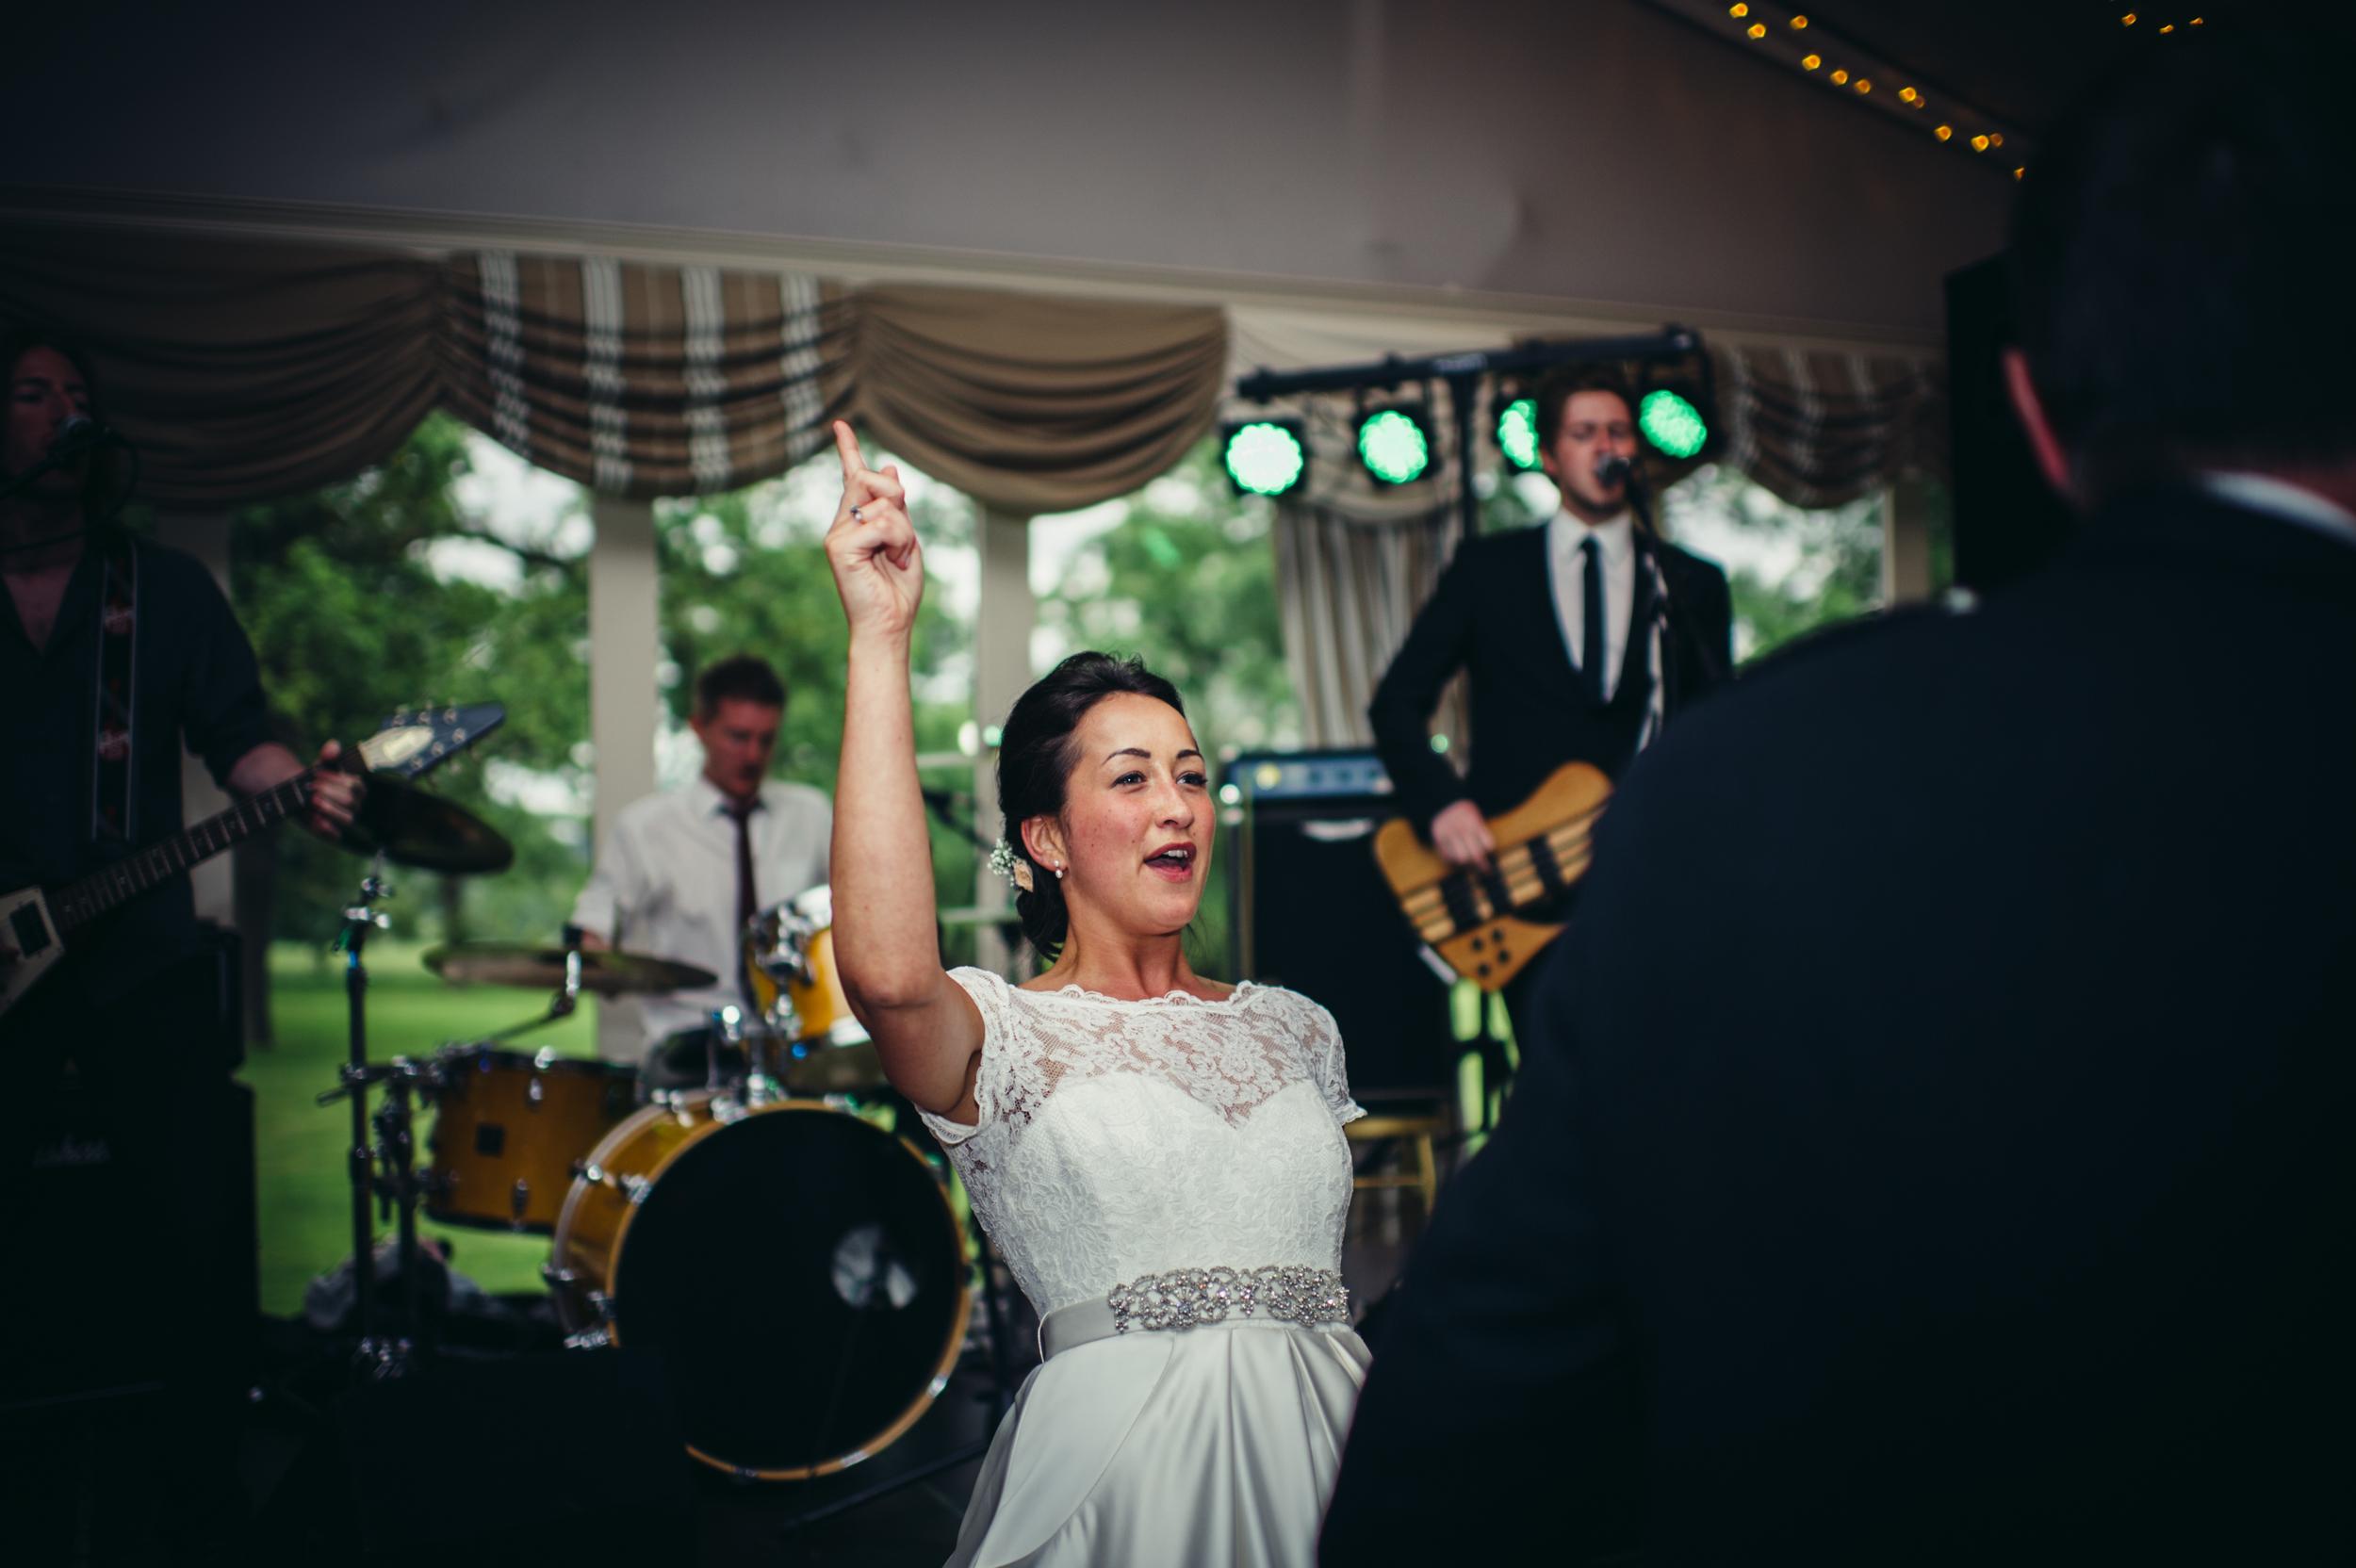 0189-lisa-devine-alternative-creative-wedding-photography-glasgow-edinburgh.JPG